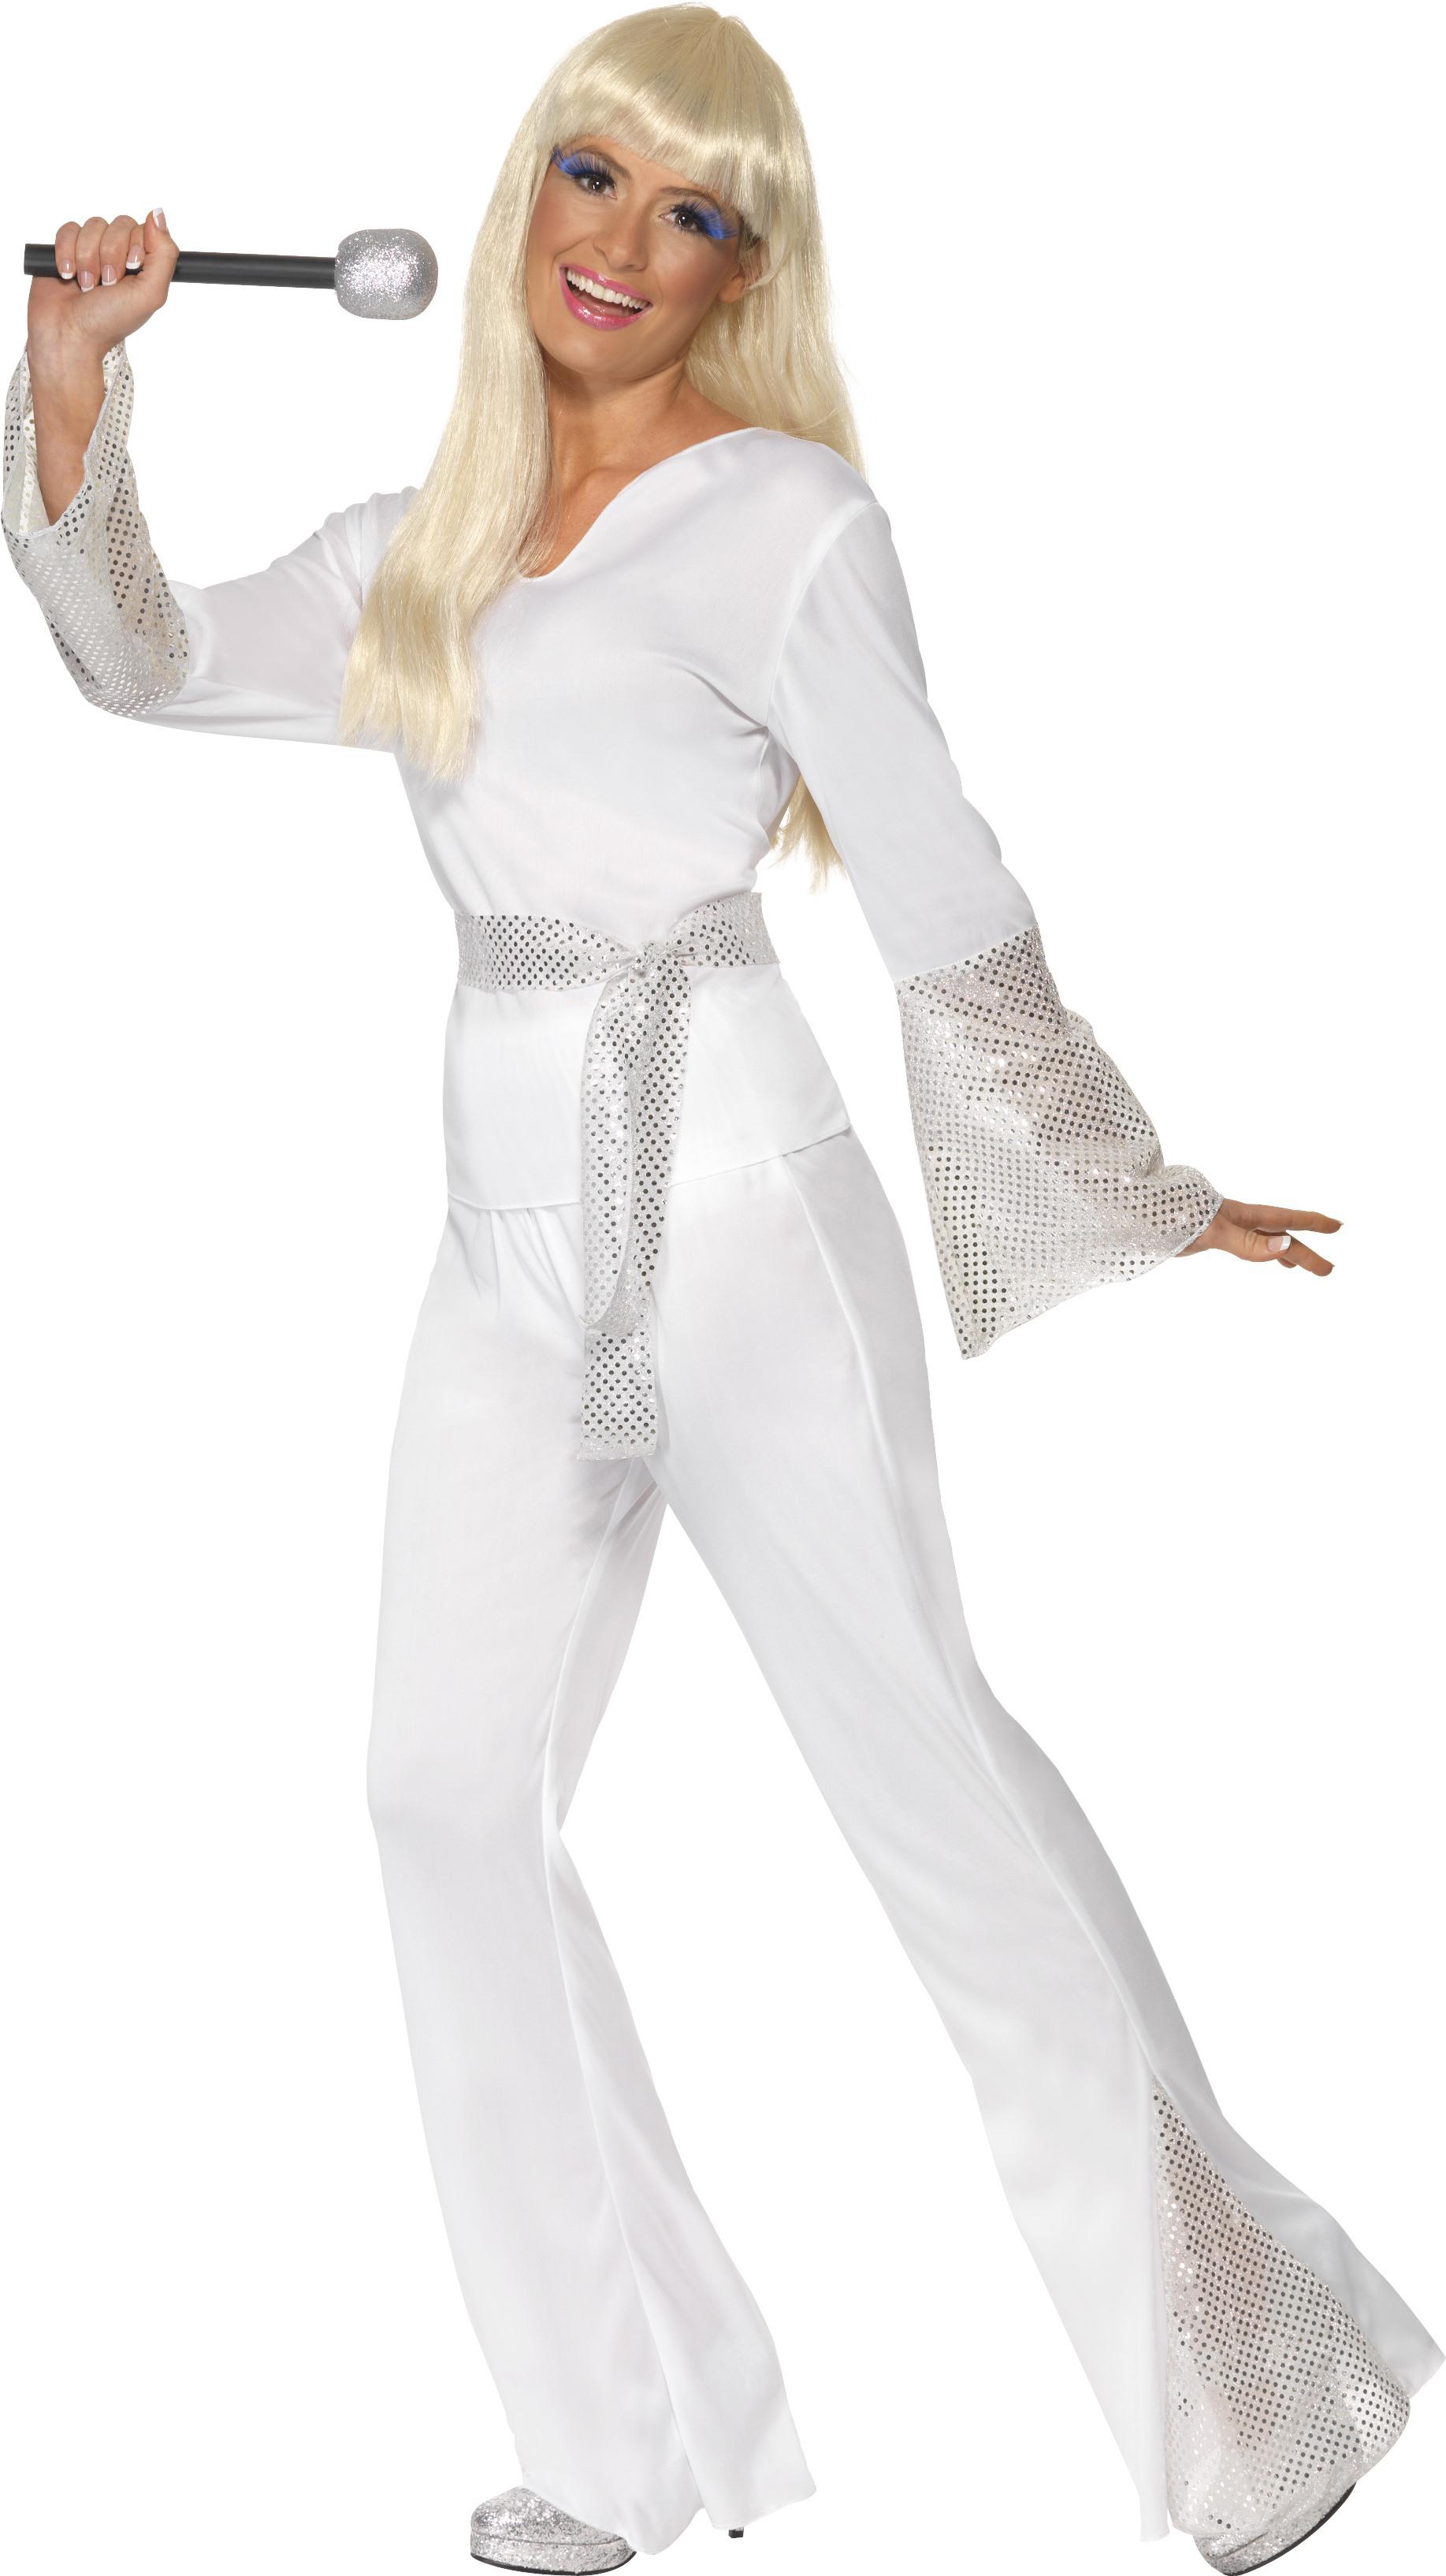 ba8e8e7d 70s Disco Lady Costume | Mega Fancy Dress